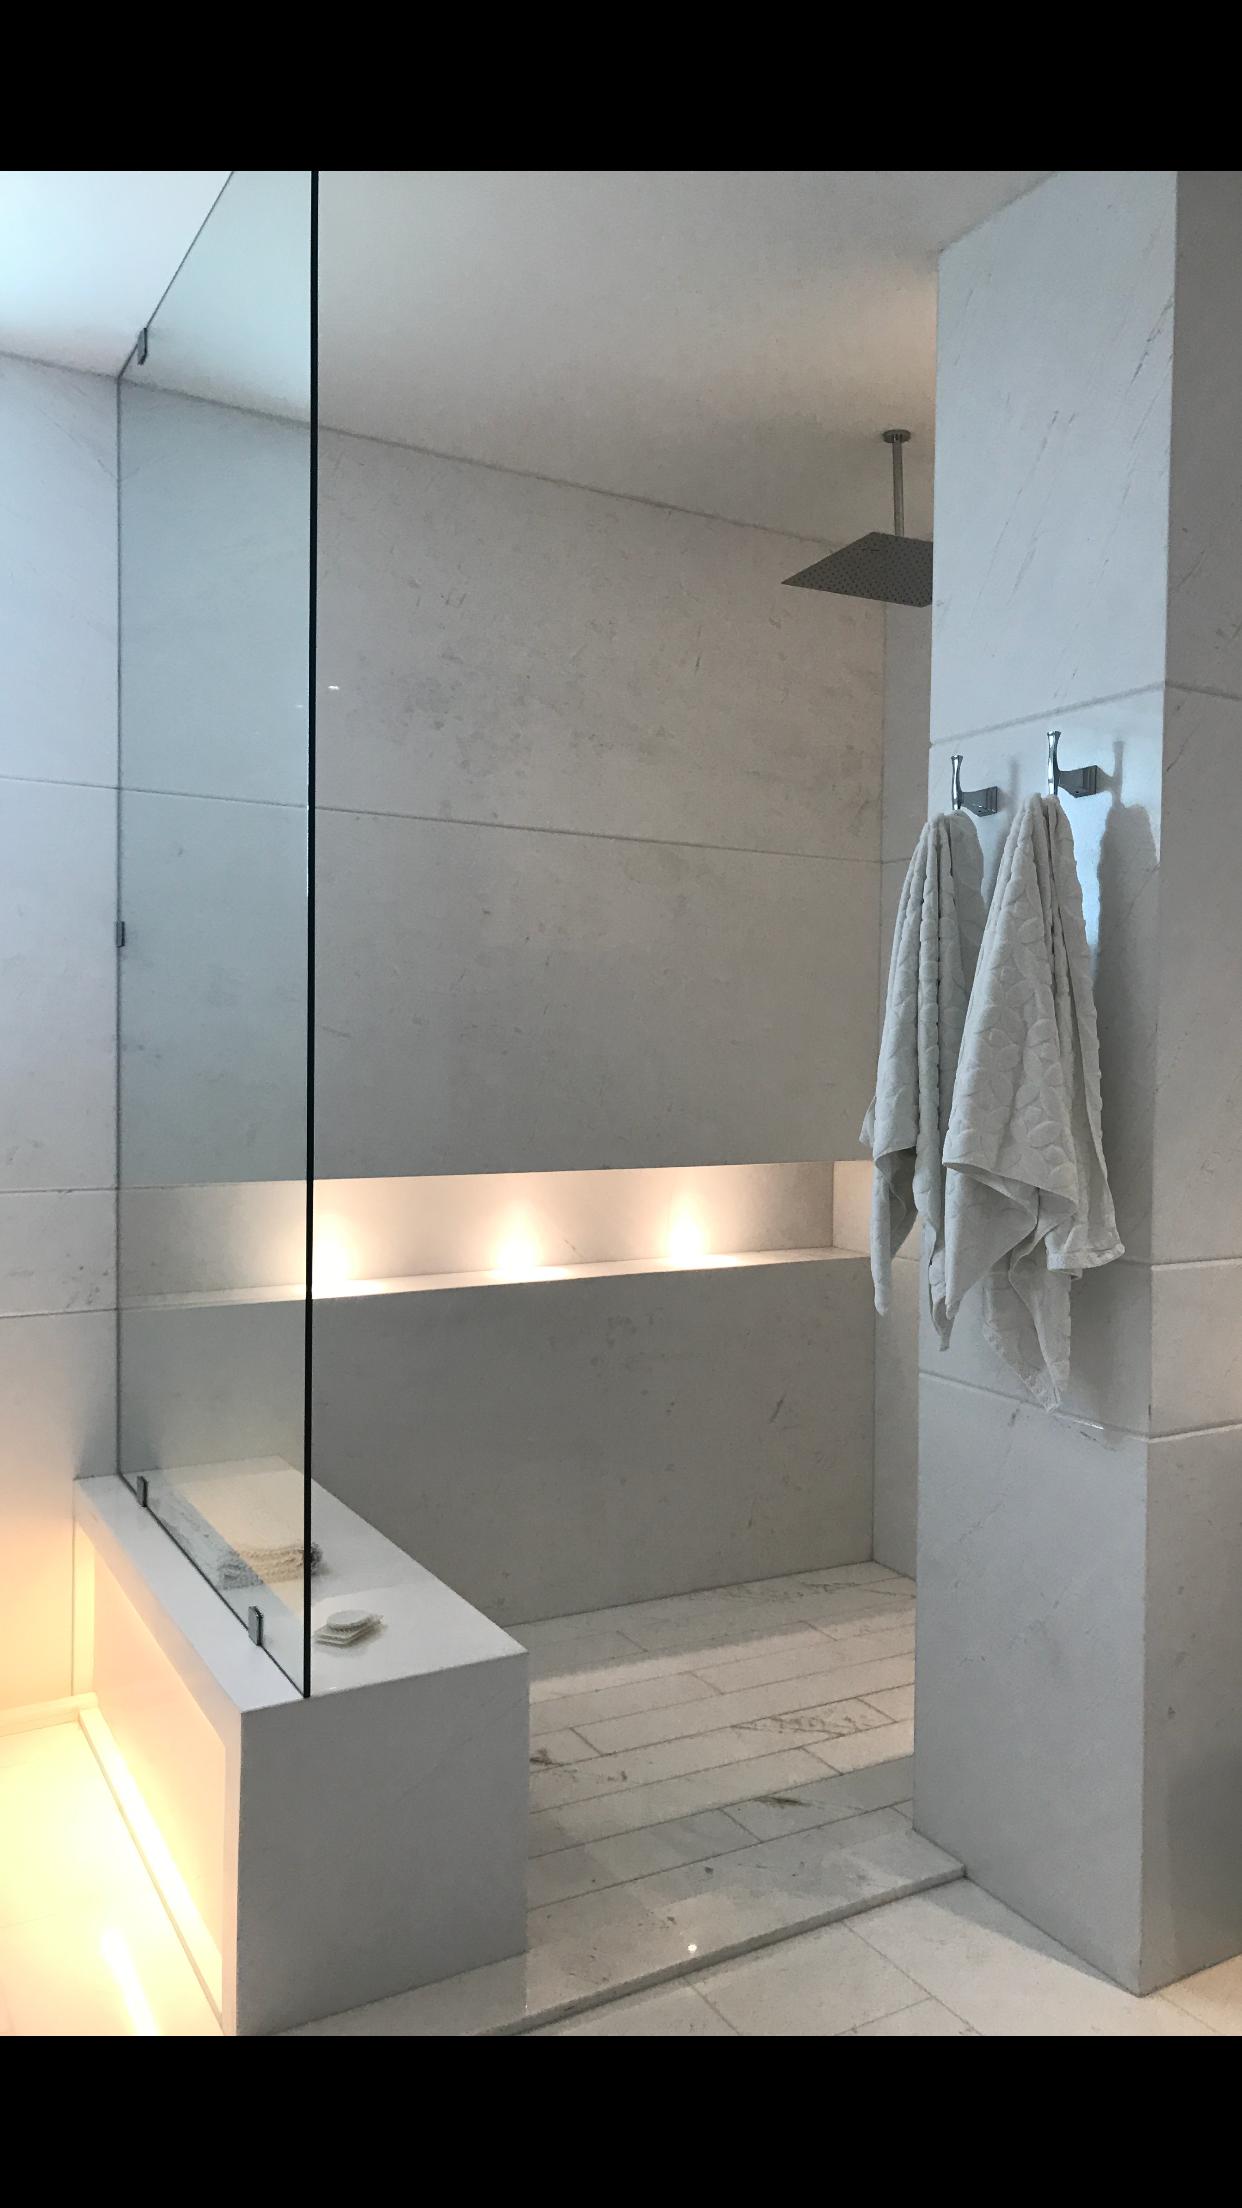 Bathroom sitting in shower lights project flecha pinterest